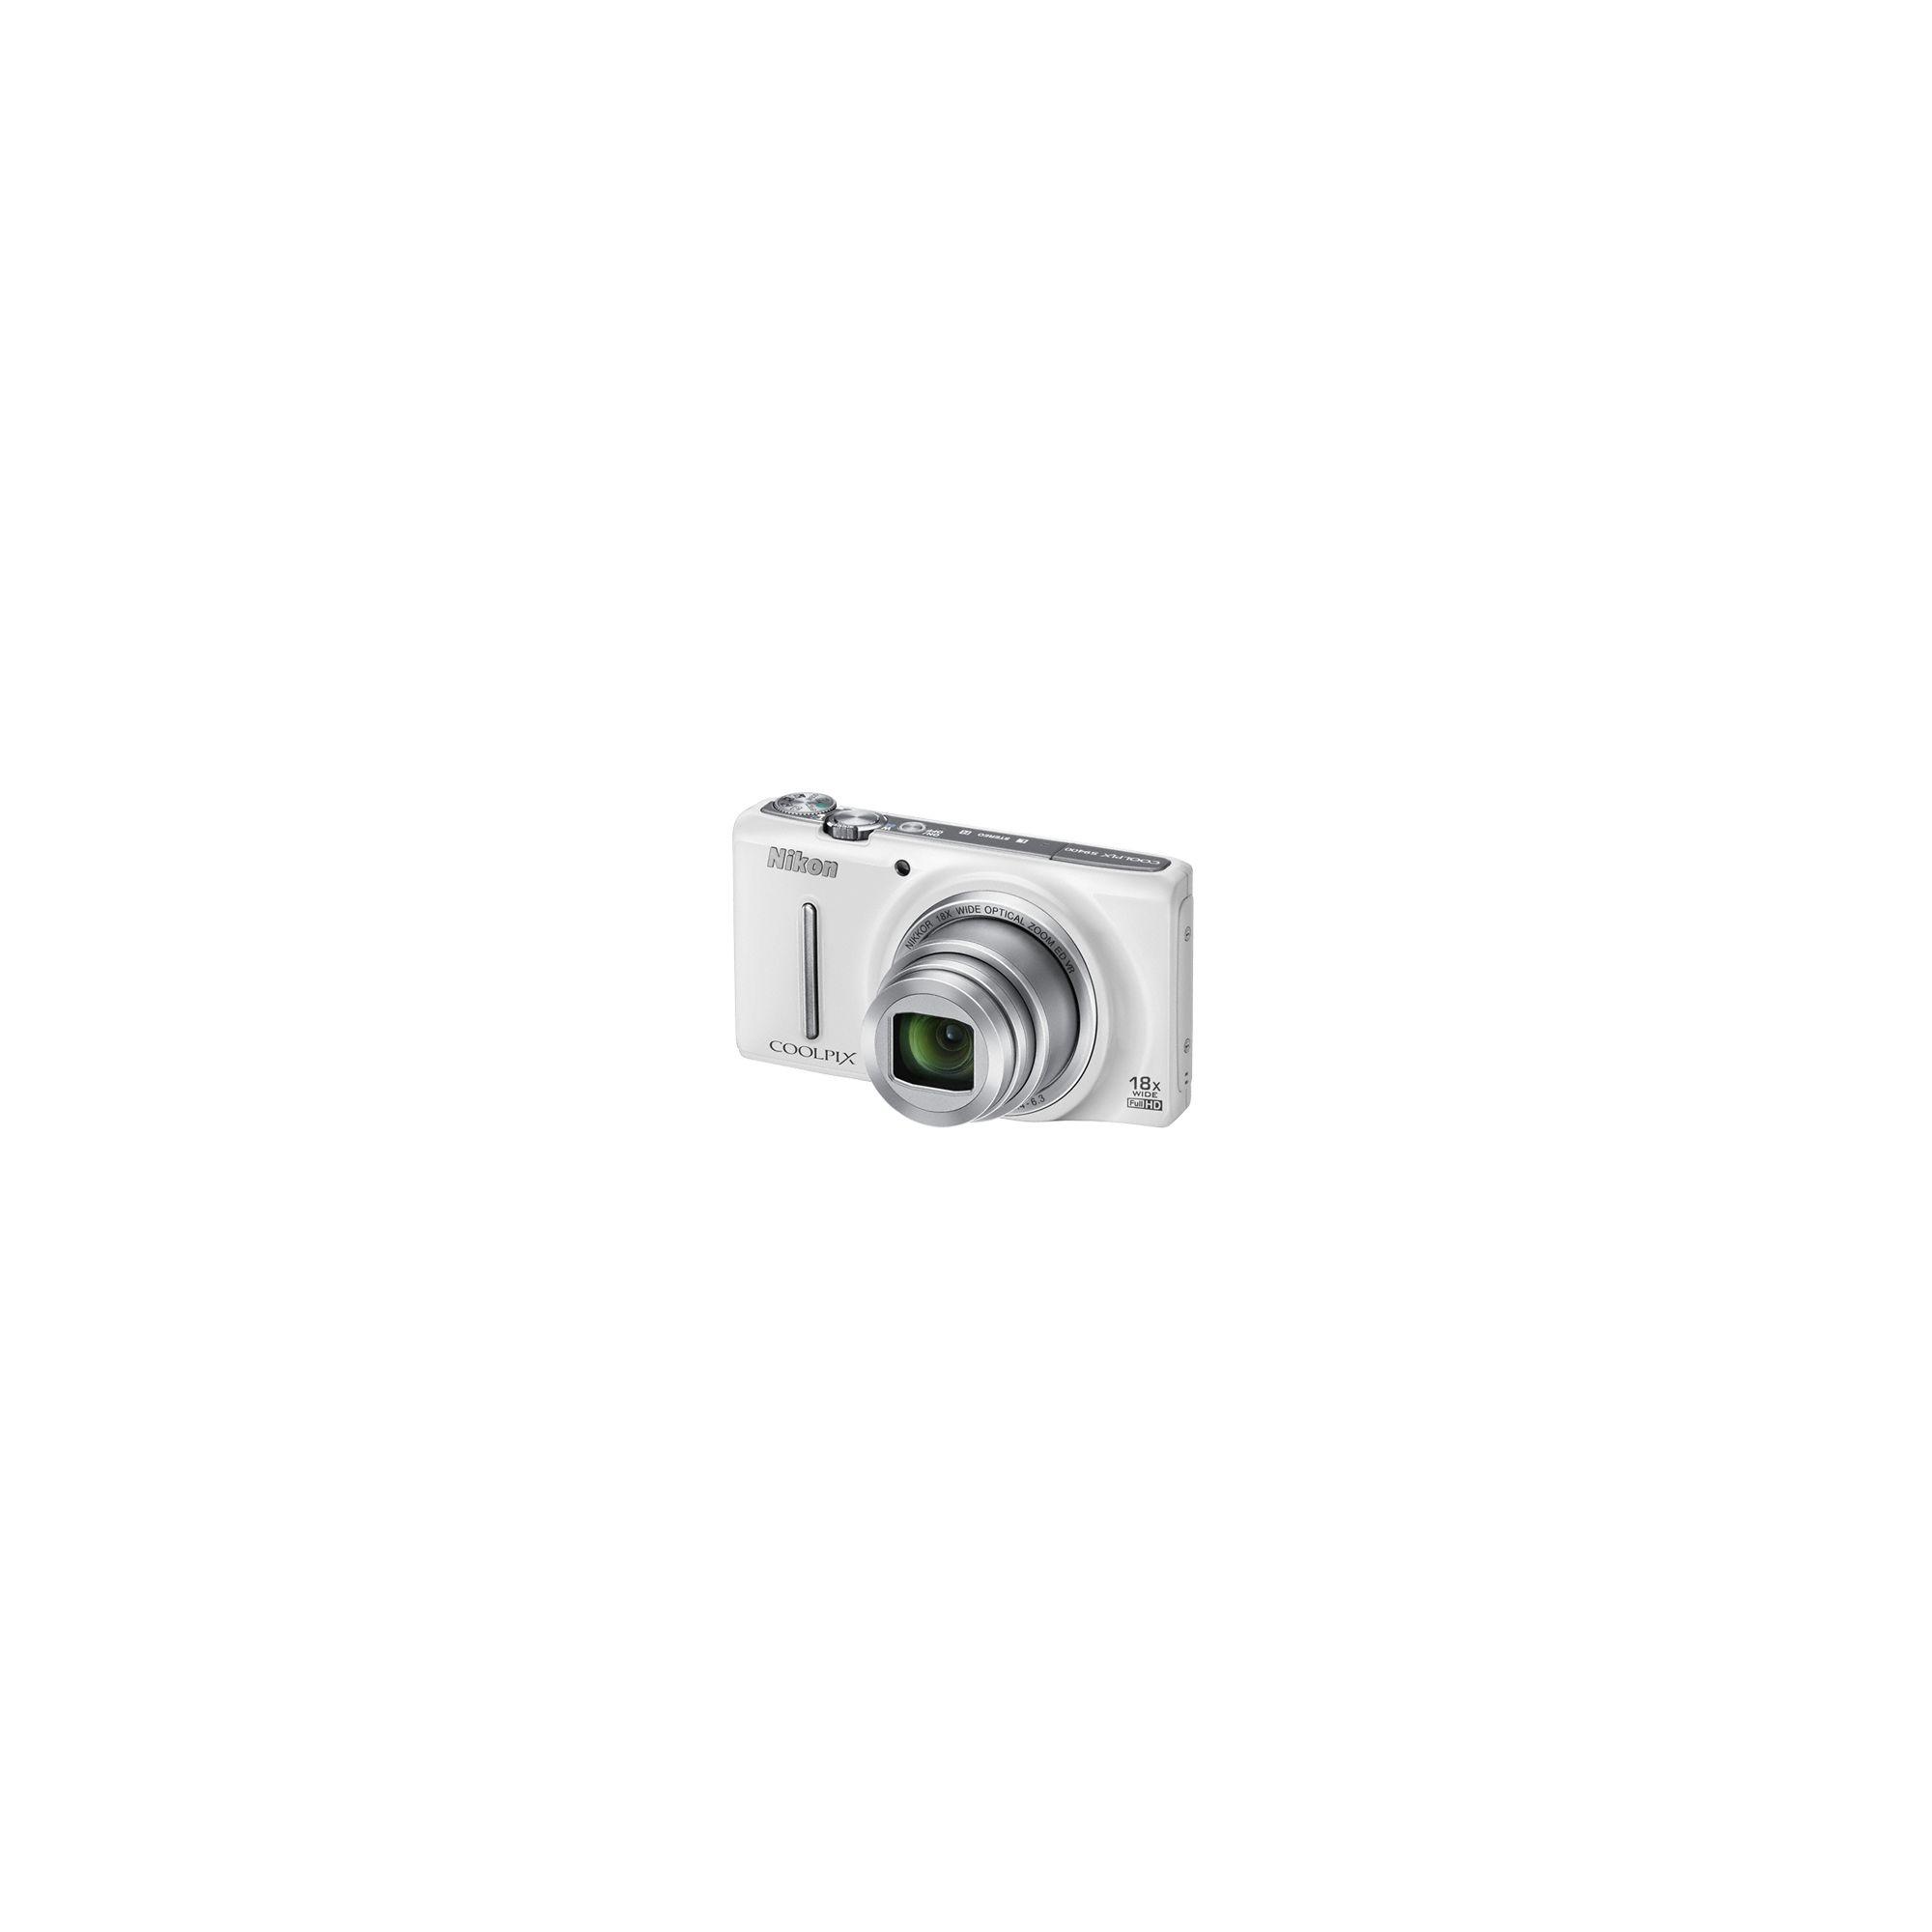 Nikon Coolpix S9400 Digital Camera, White, 18MP, 18x Zoom, 3.0 inch LCD screen